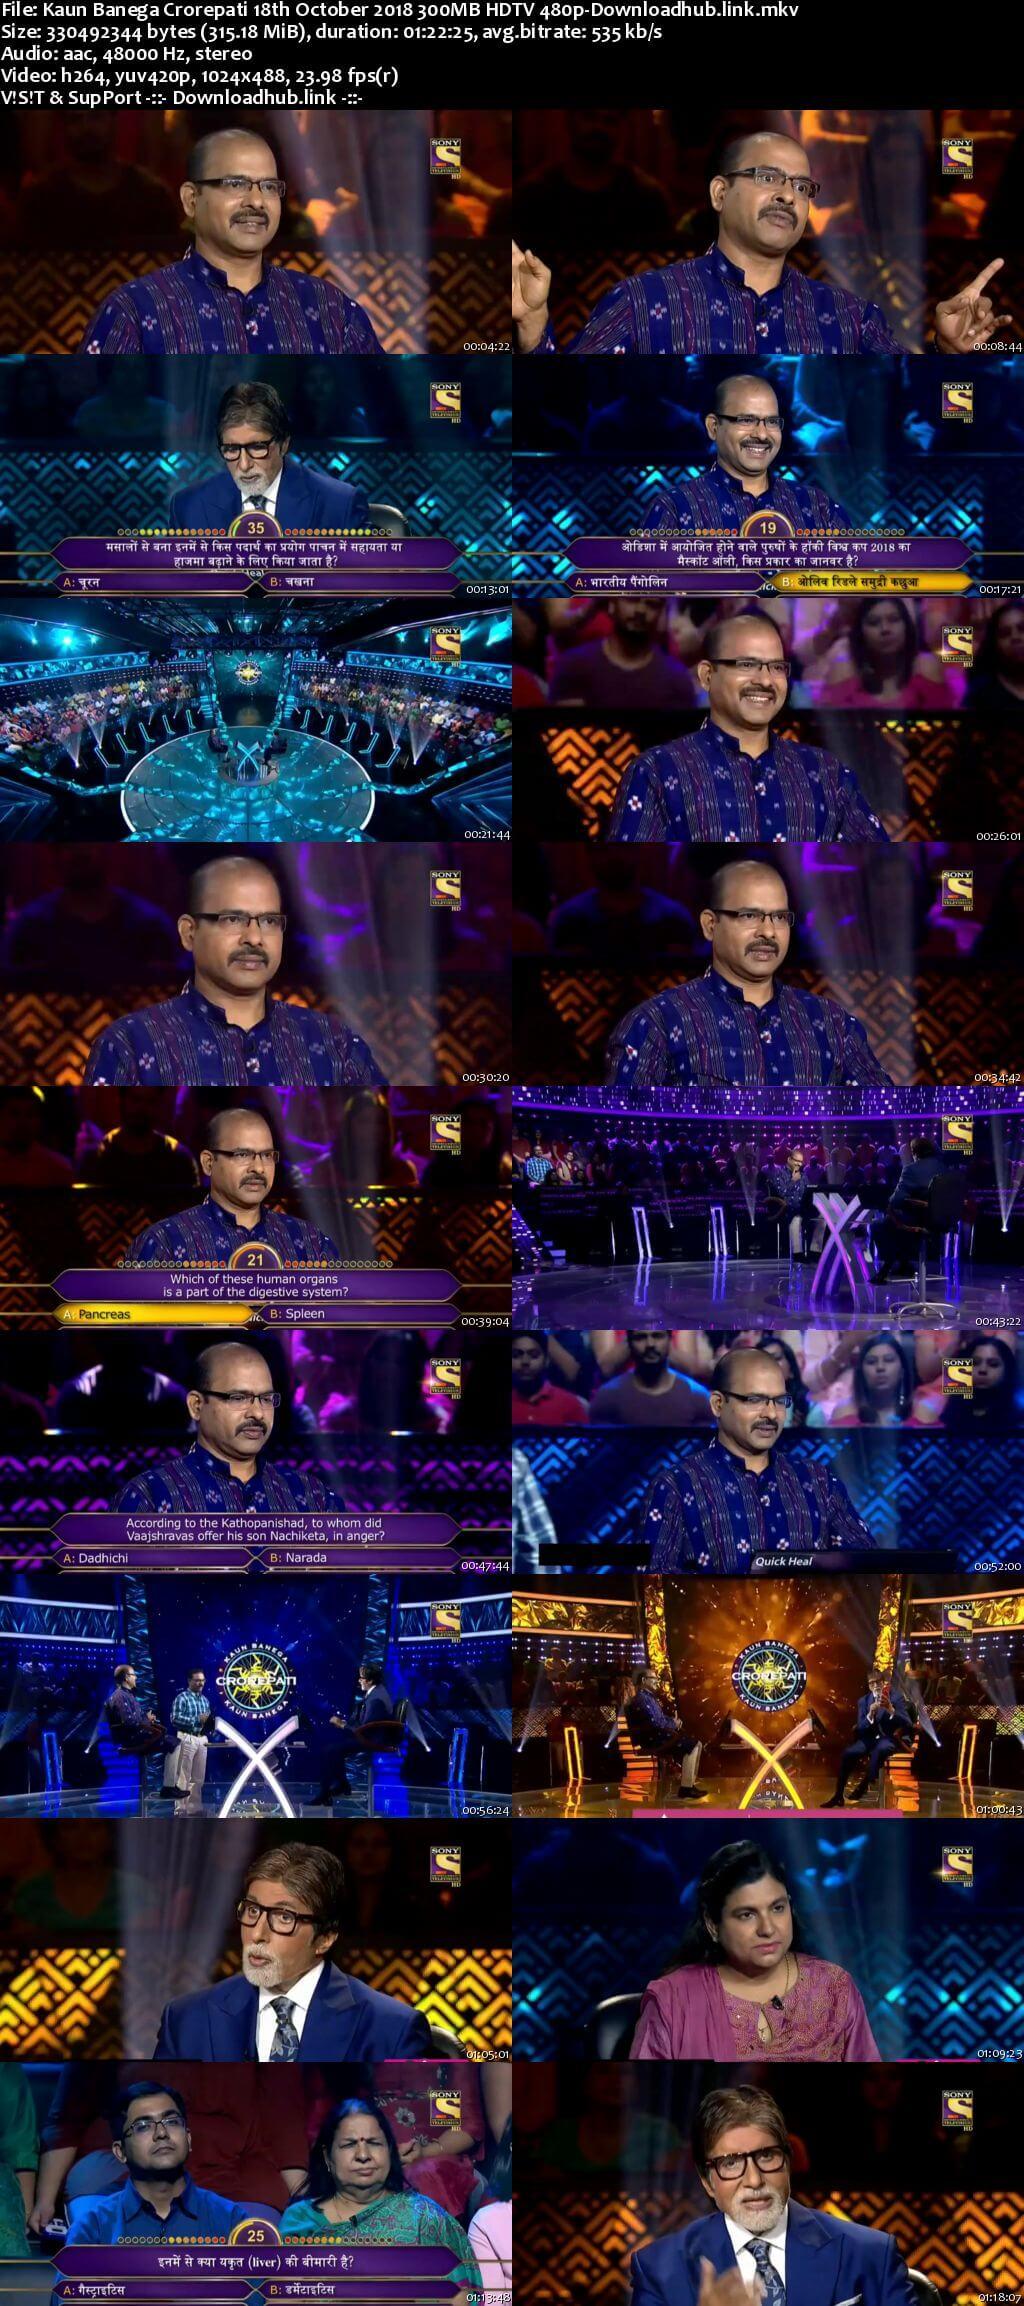 Kaun Banega Crorepati 18th October 2018 300MB HDTV 480p